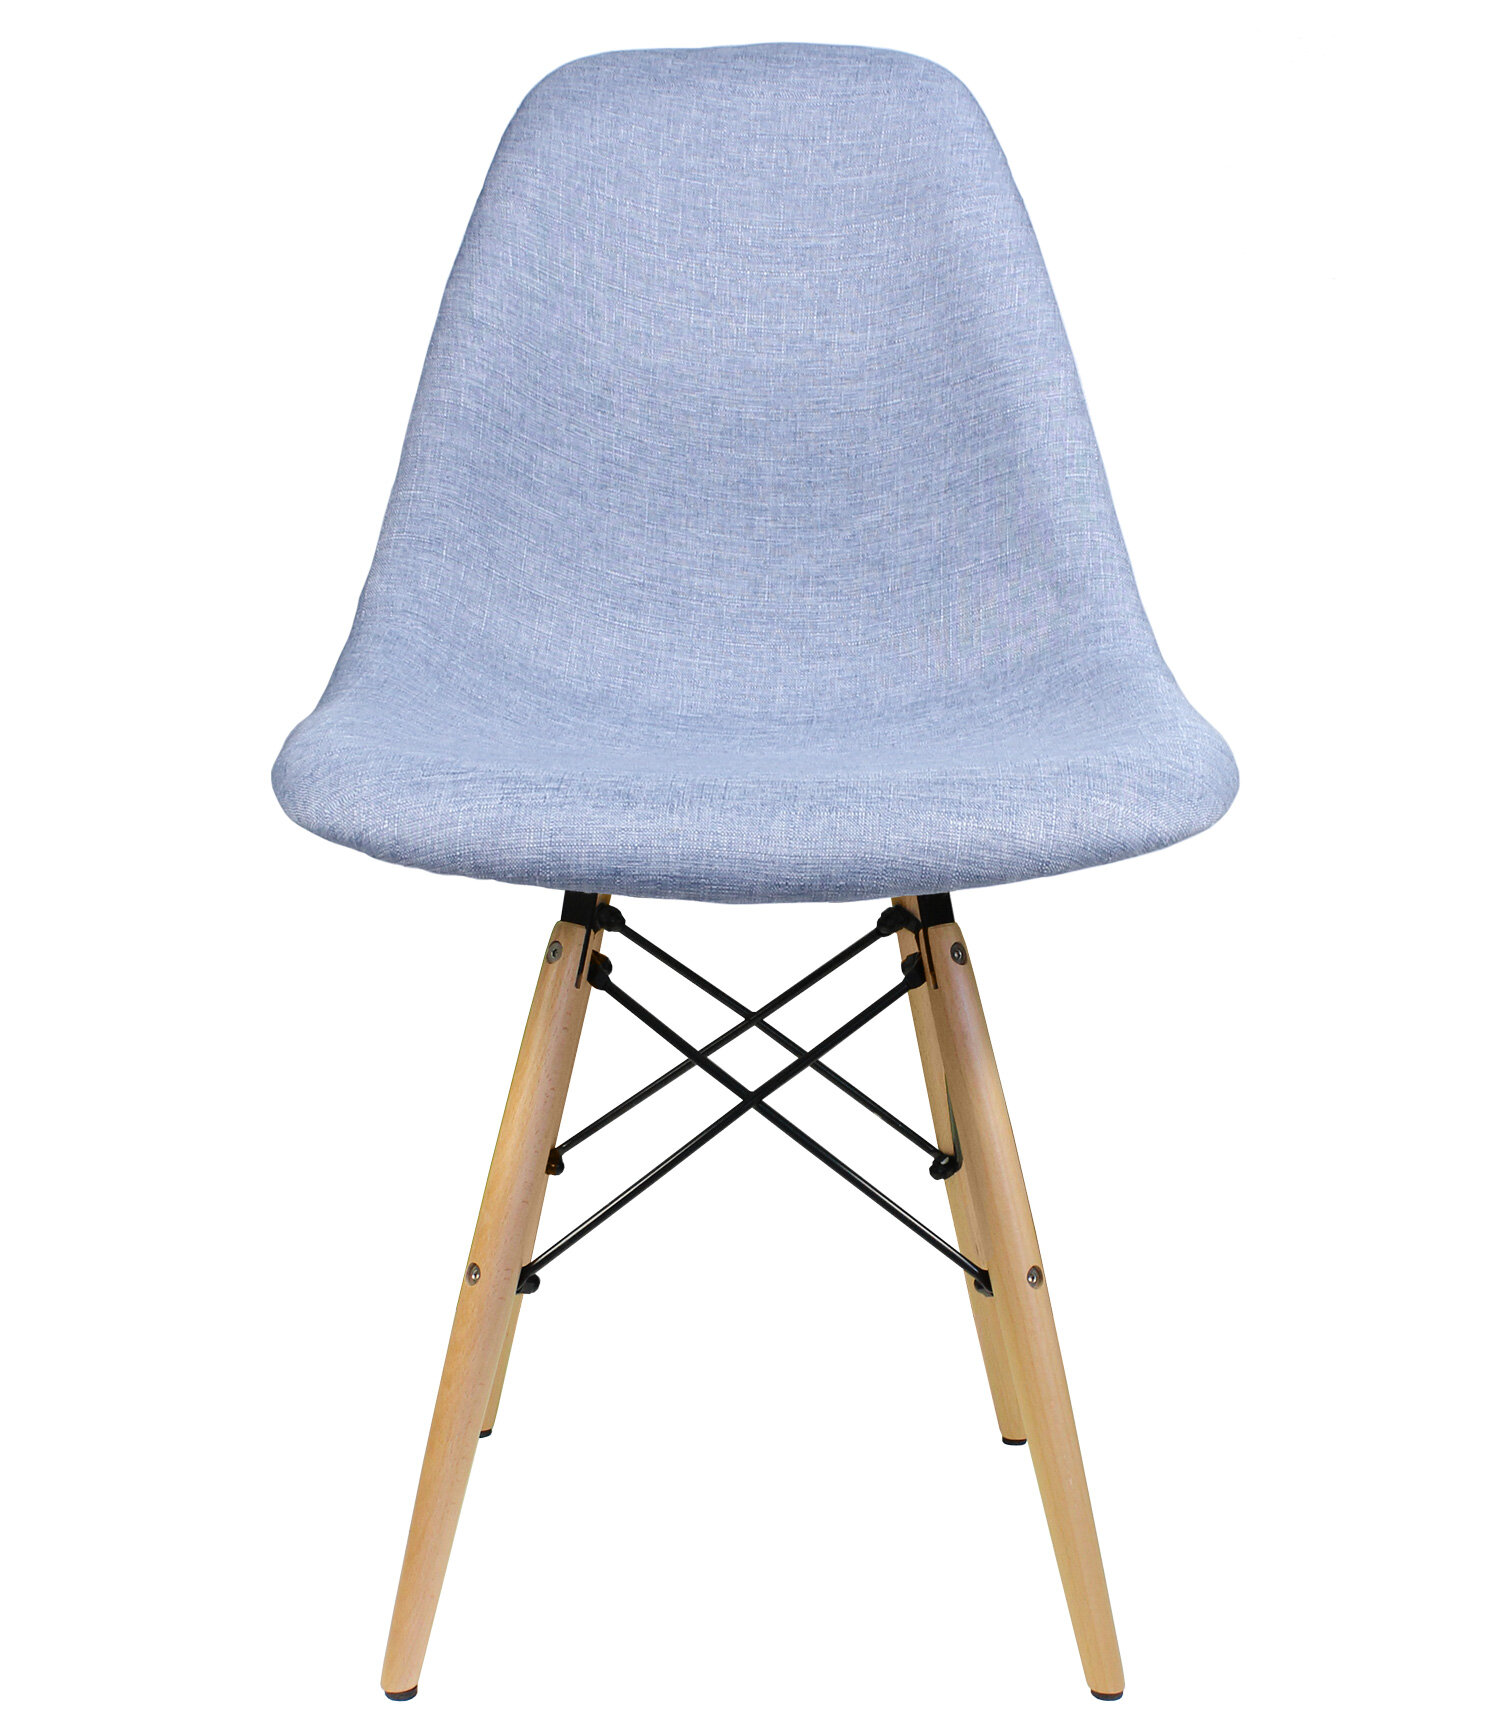 Stupendous Denim Side Chair Cjindustries Chair Design For Home Cjindustriesco